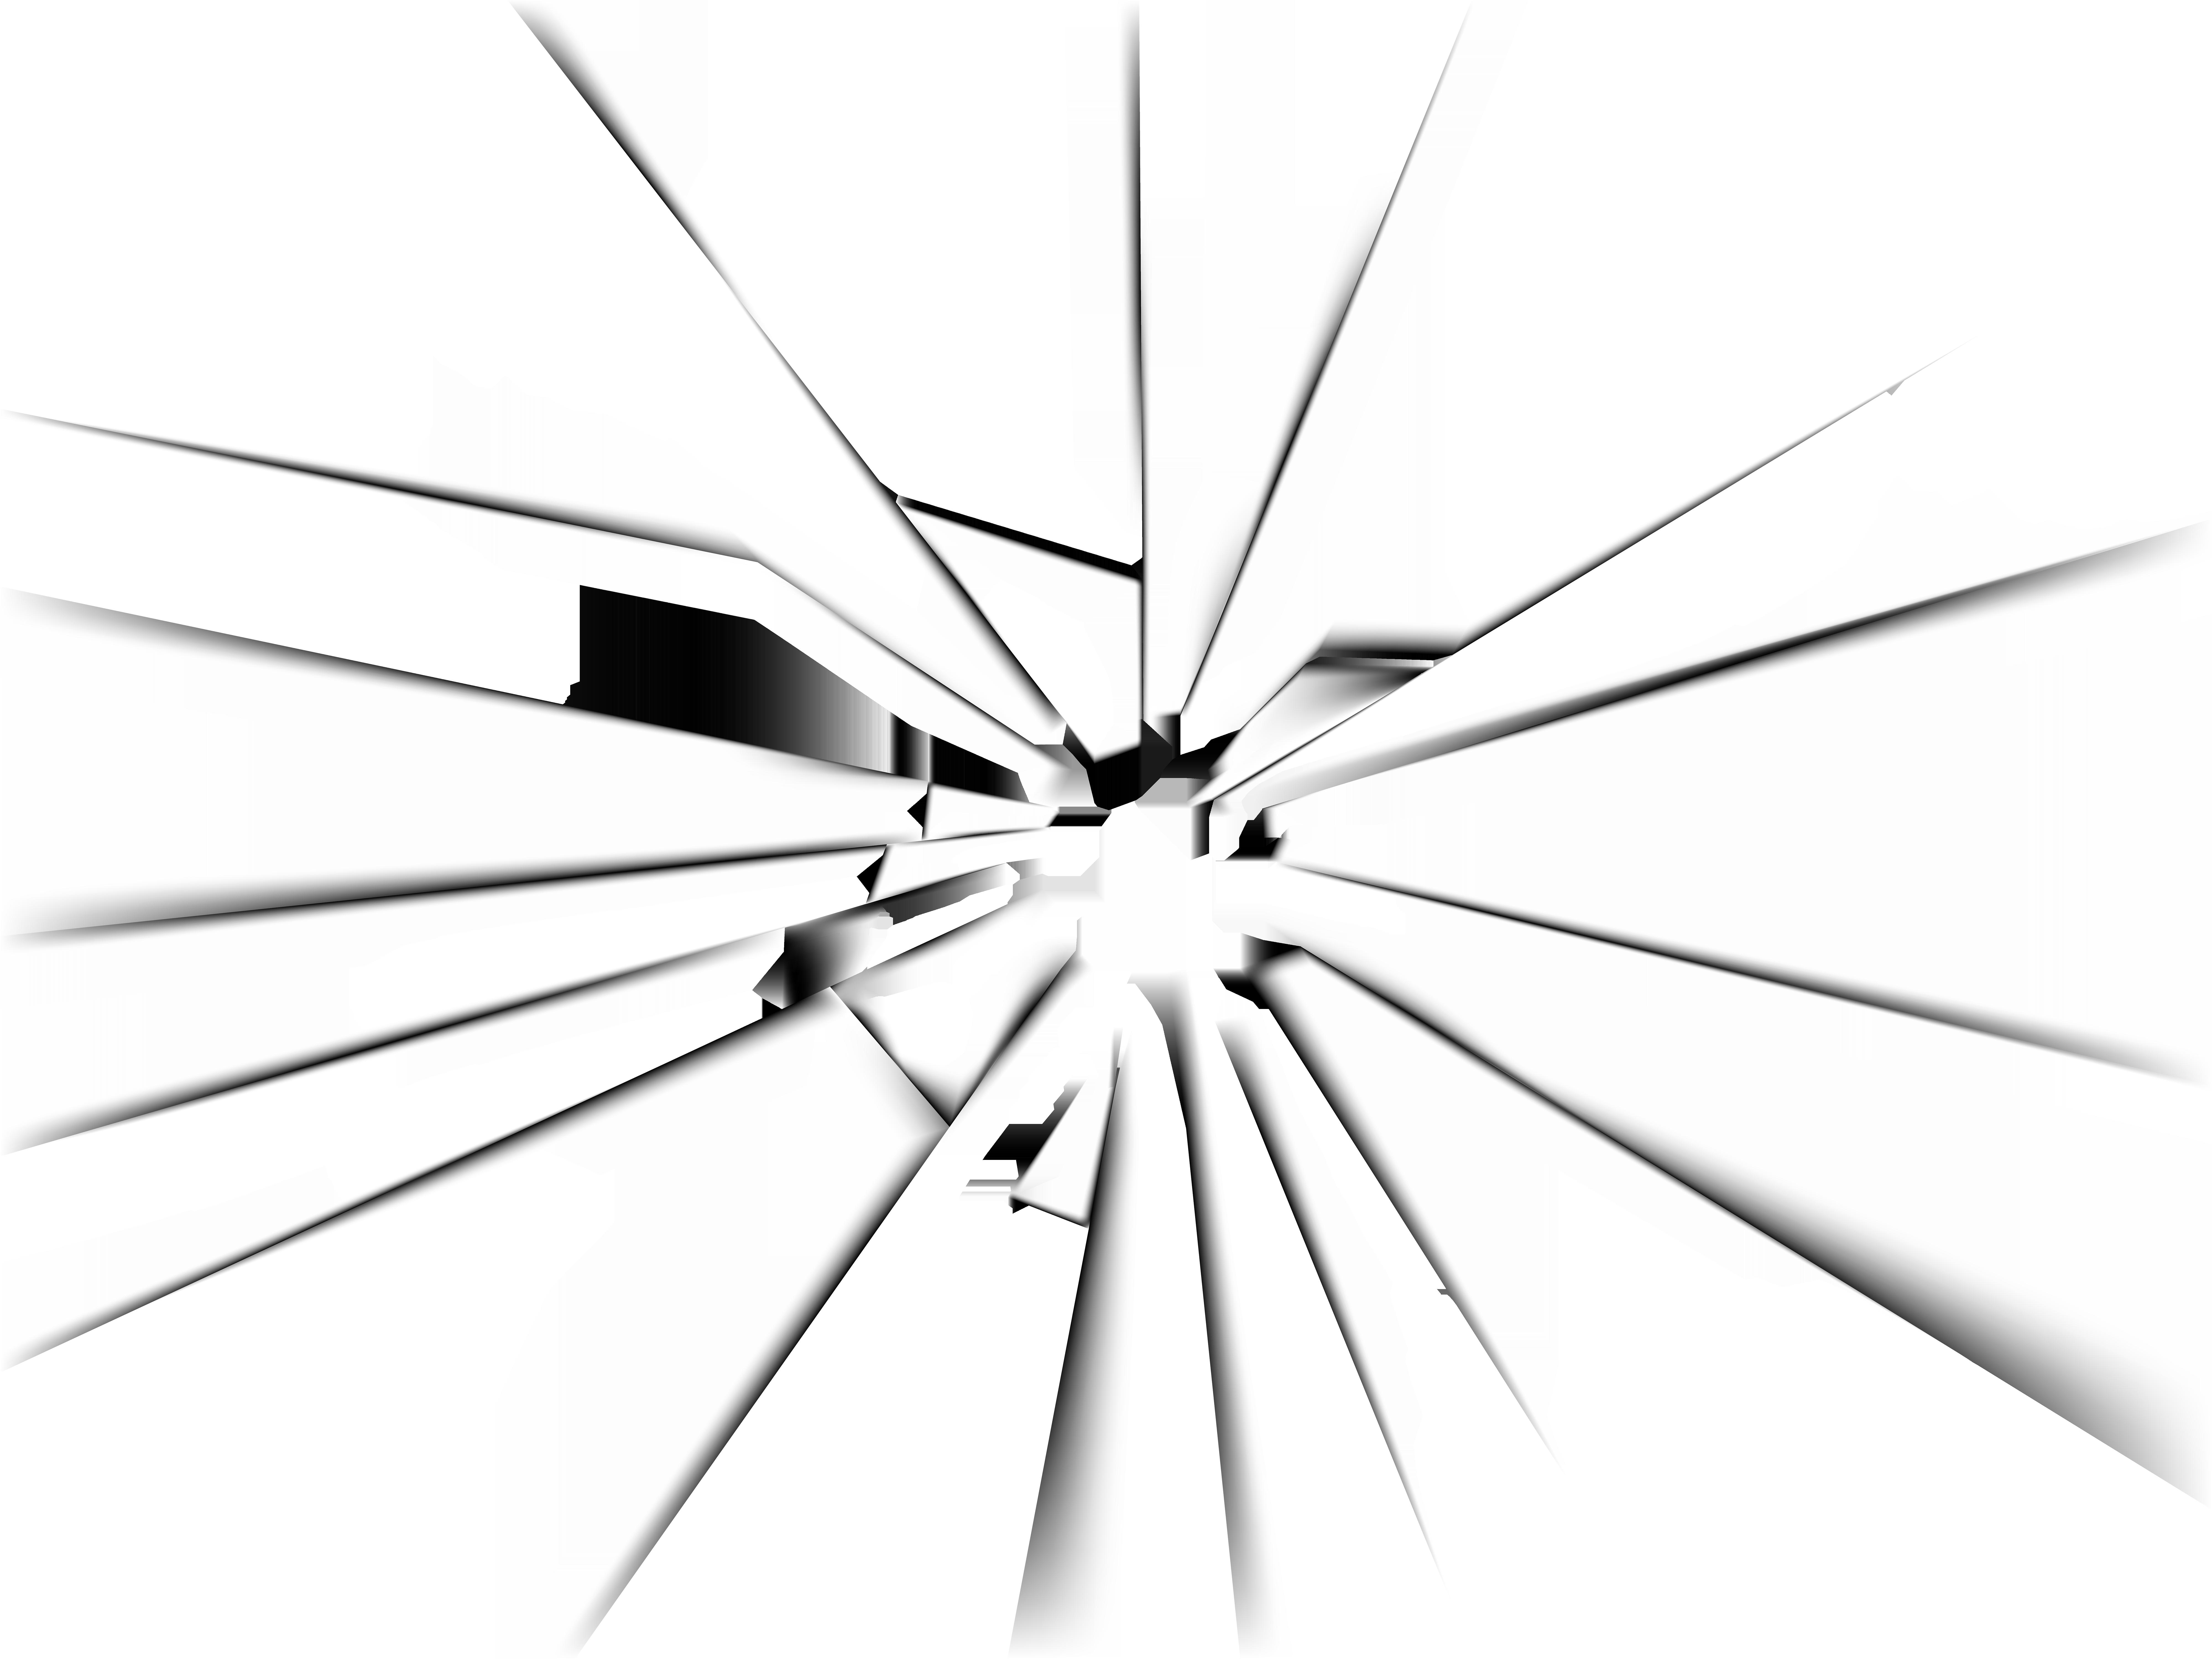 Criss cross window panes clipart jpg freeuse stock Broken Glass Transparent PNG Clip Art Image | Web design | Pinterest ... jpg freeuse stock